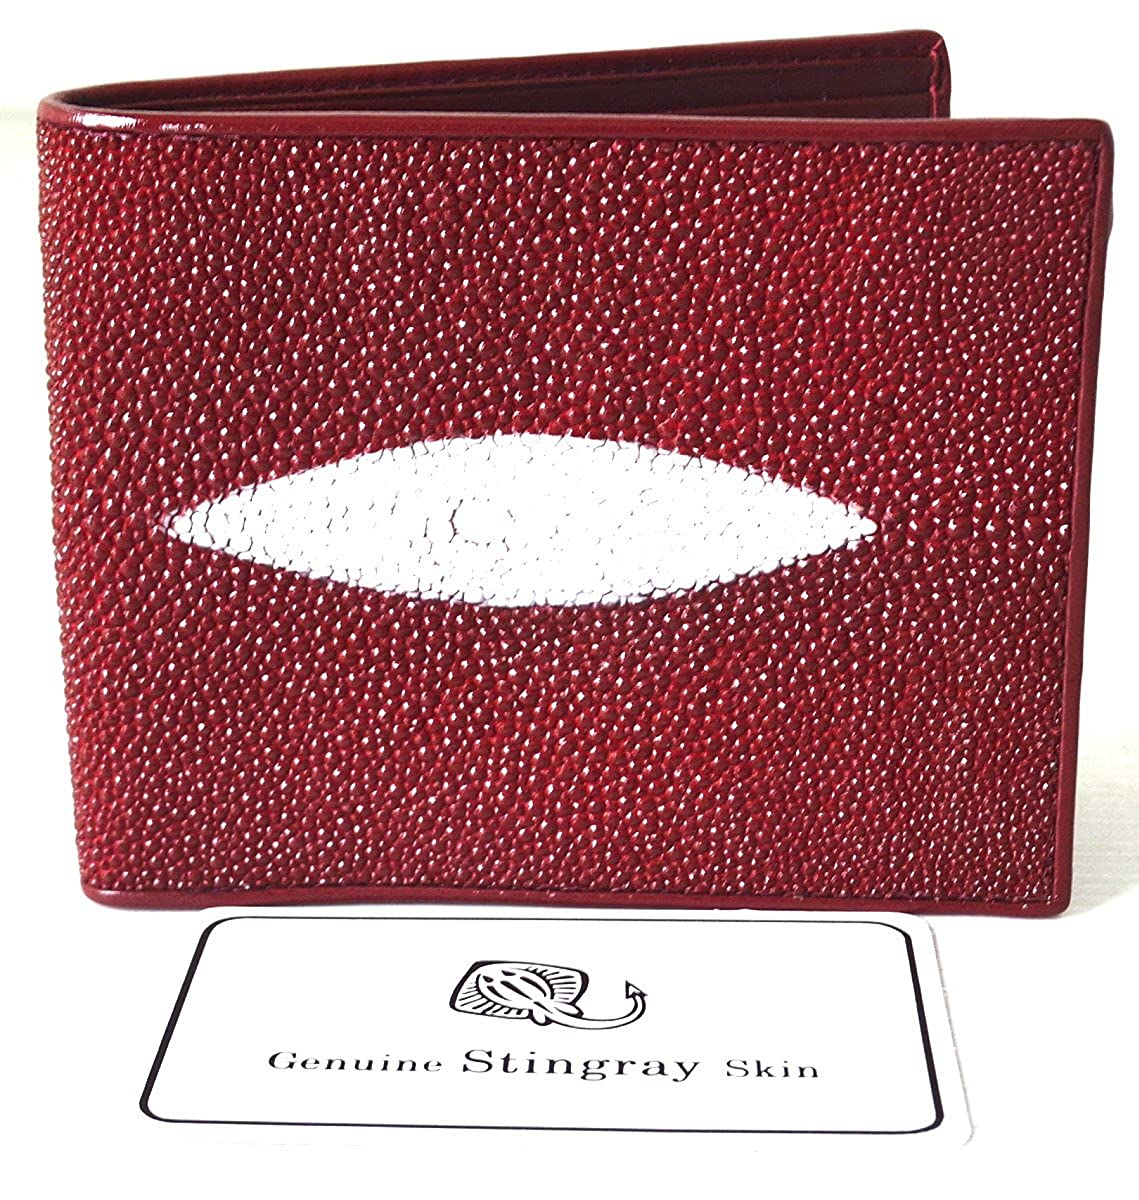 Genuine Real 1 Eye Stingray Skin Leather Man Bifold Shiny Black Bag Wallet New